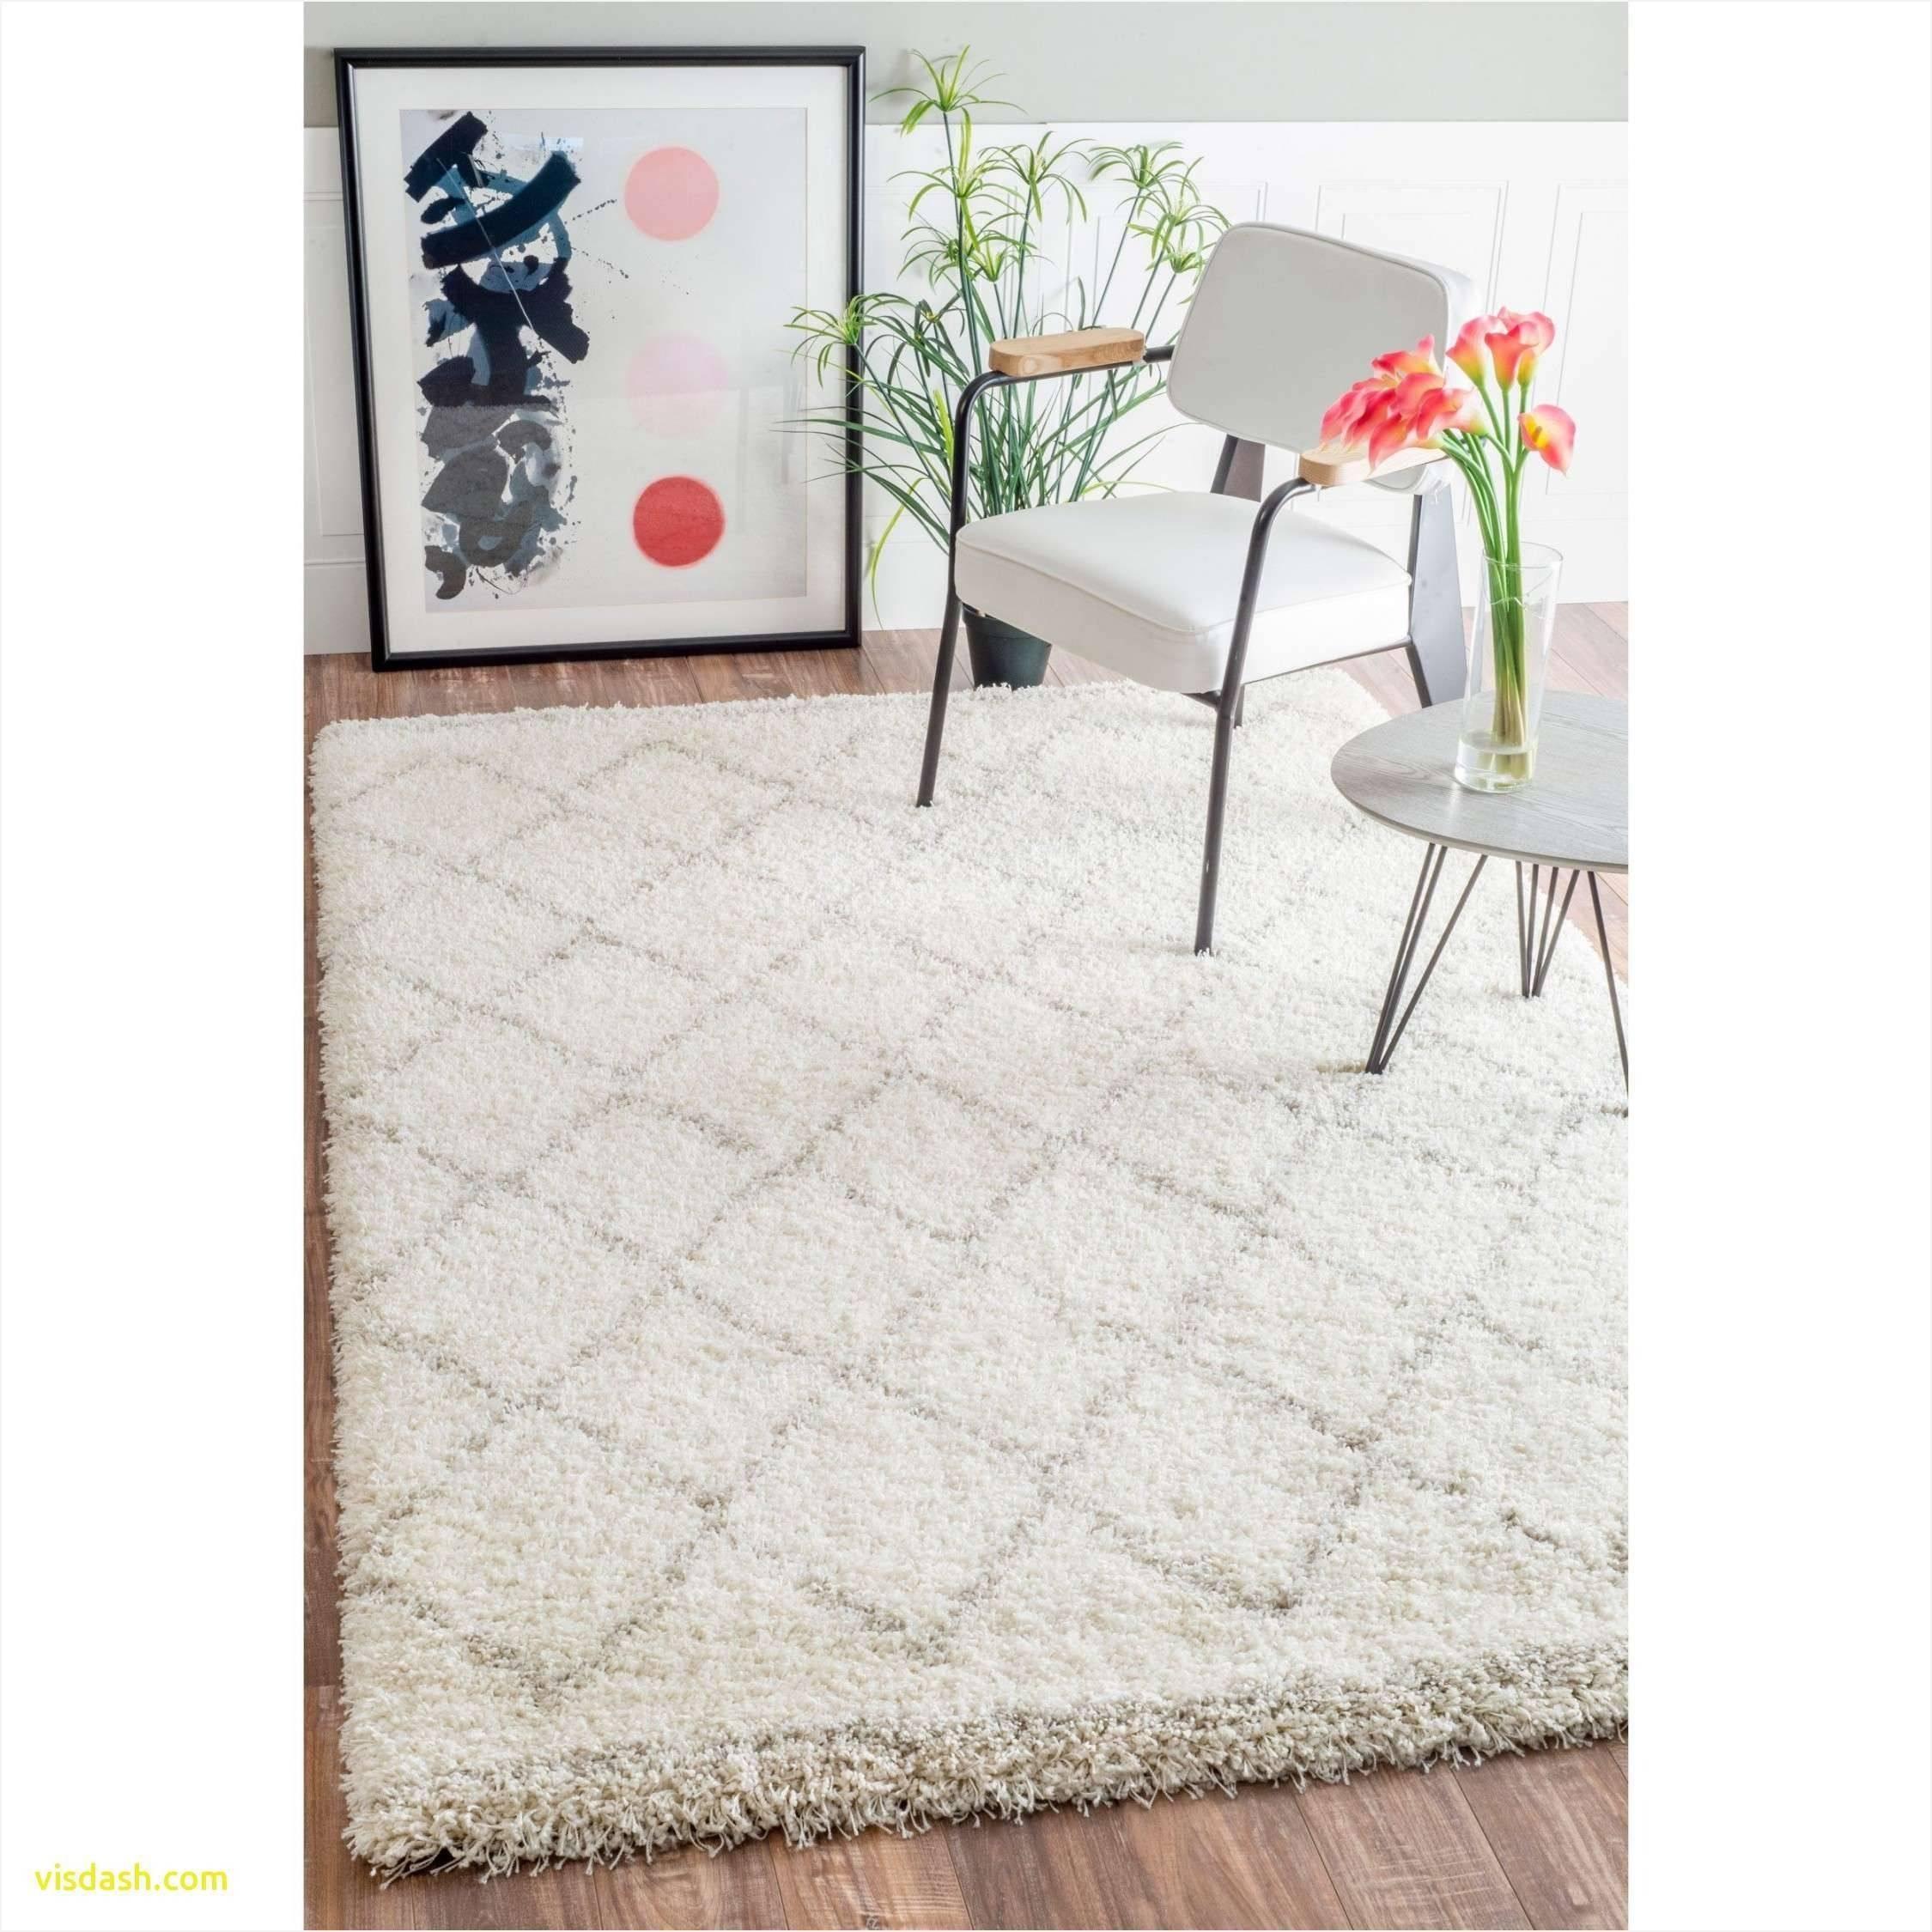 difference between rug and carpet unique rug unique children s bedroom area rugs elegant trellis rug 0d photograph of difference between rug and carpet